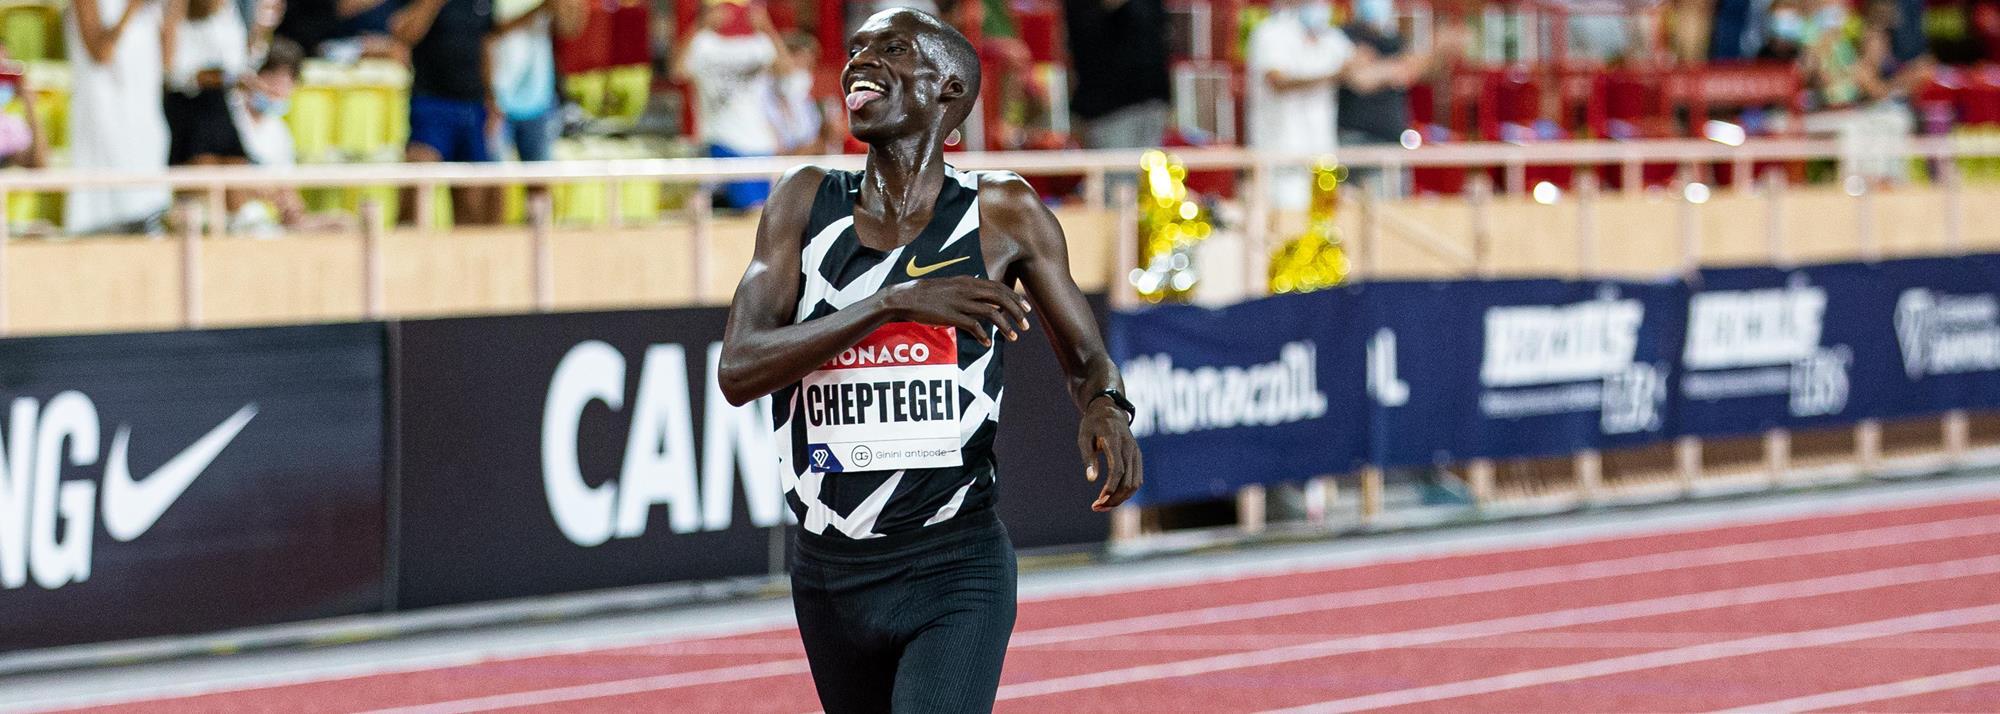 Cheptegei breaks world 5000m record in Monaco as Diamond League action returns